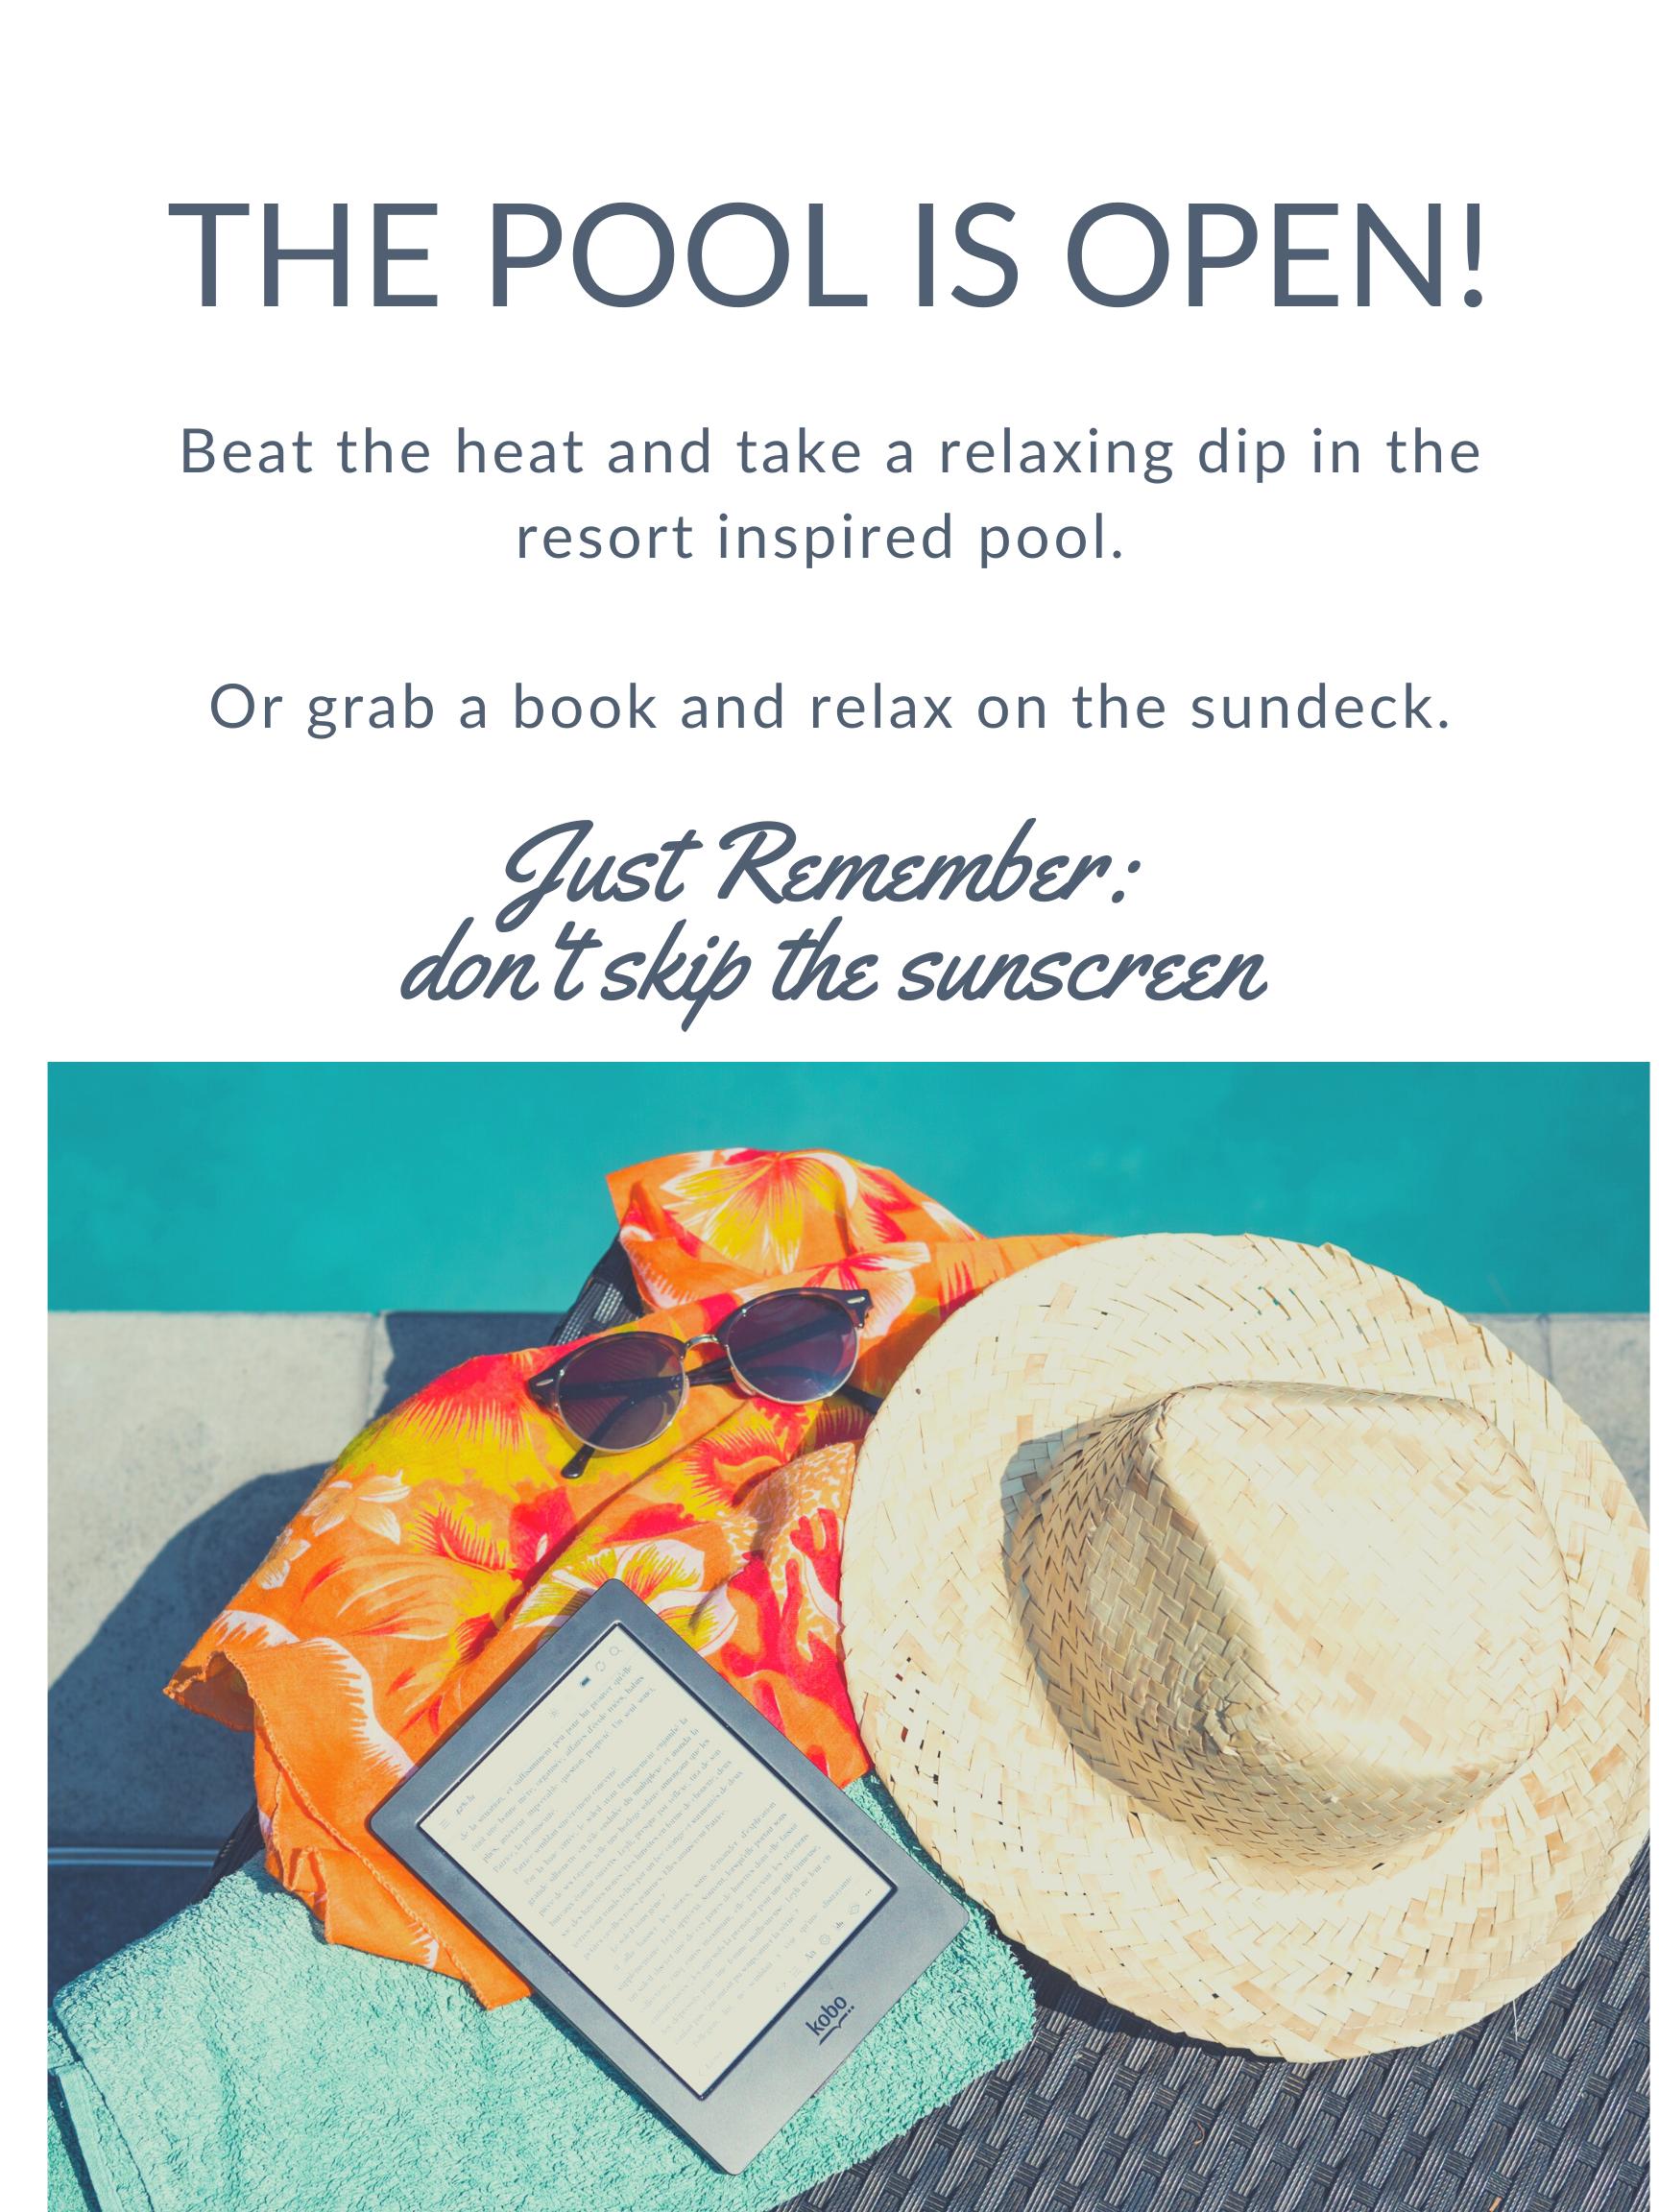 pool flyer for resort inspired pool at Villas at Stone Oak Ranch Austin, TX